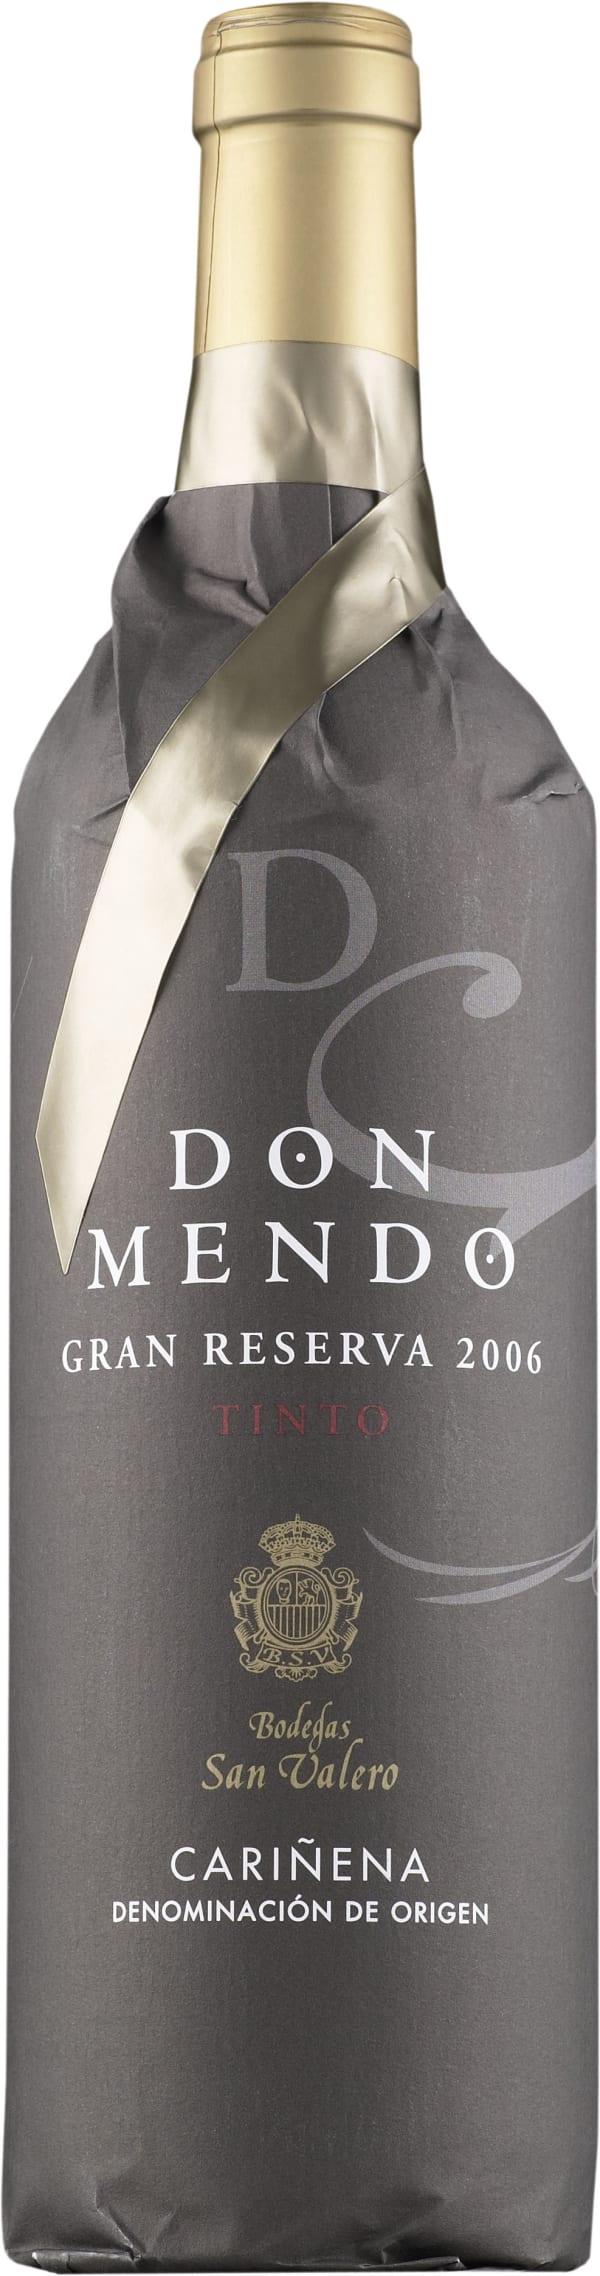 Don Mendo Gran Reserva 2010